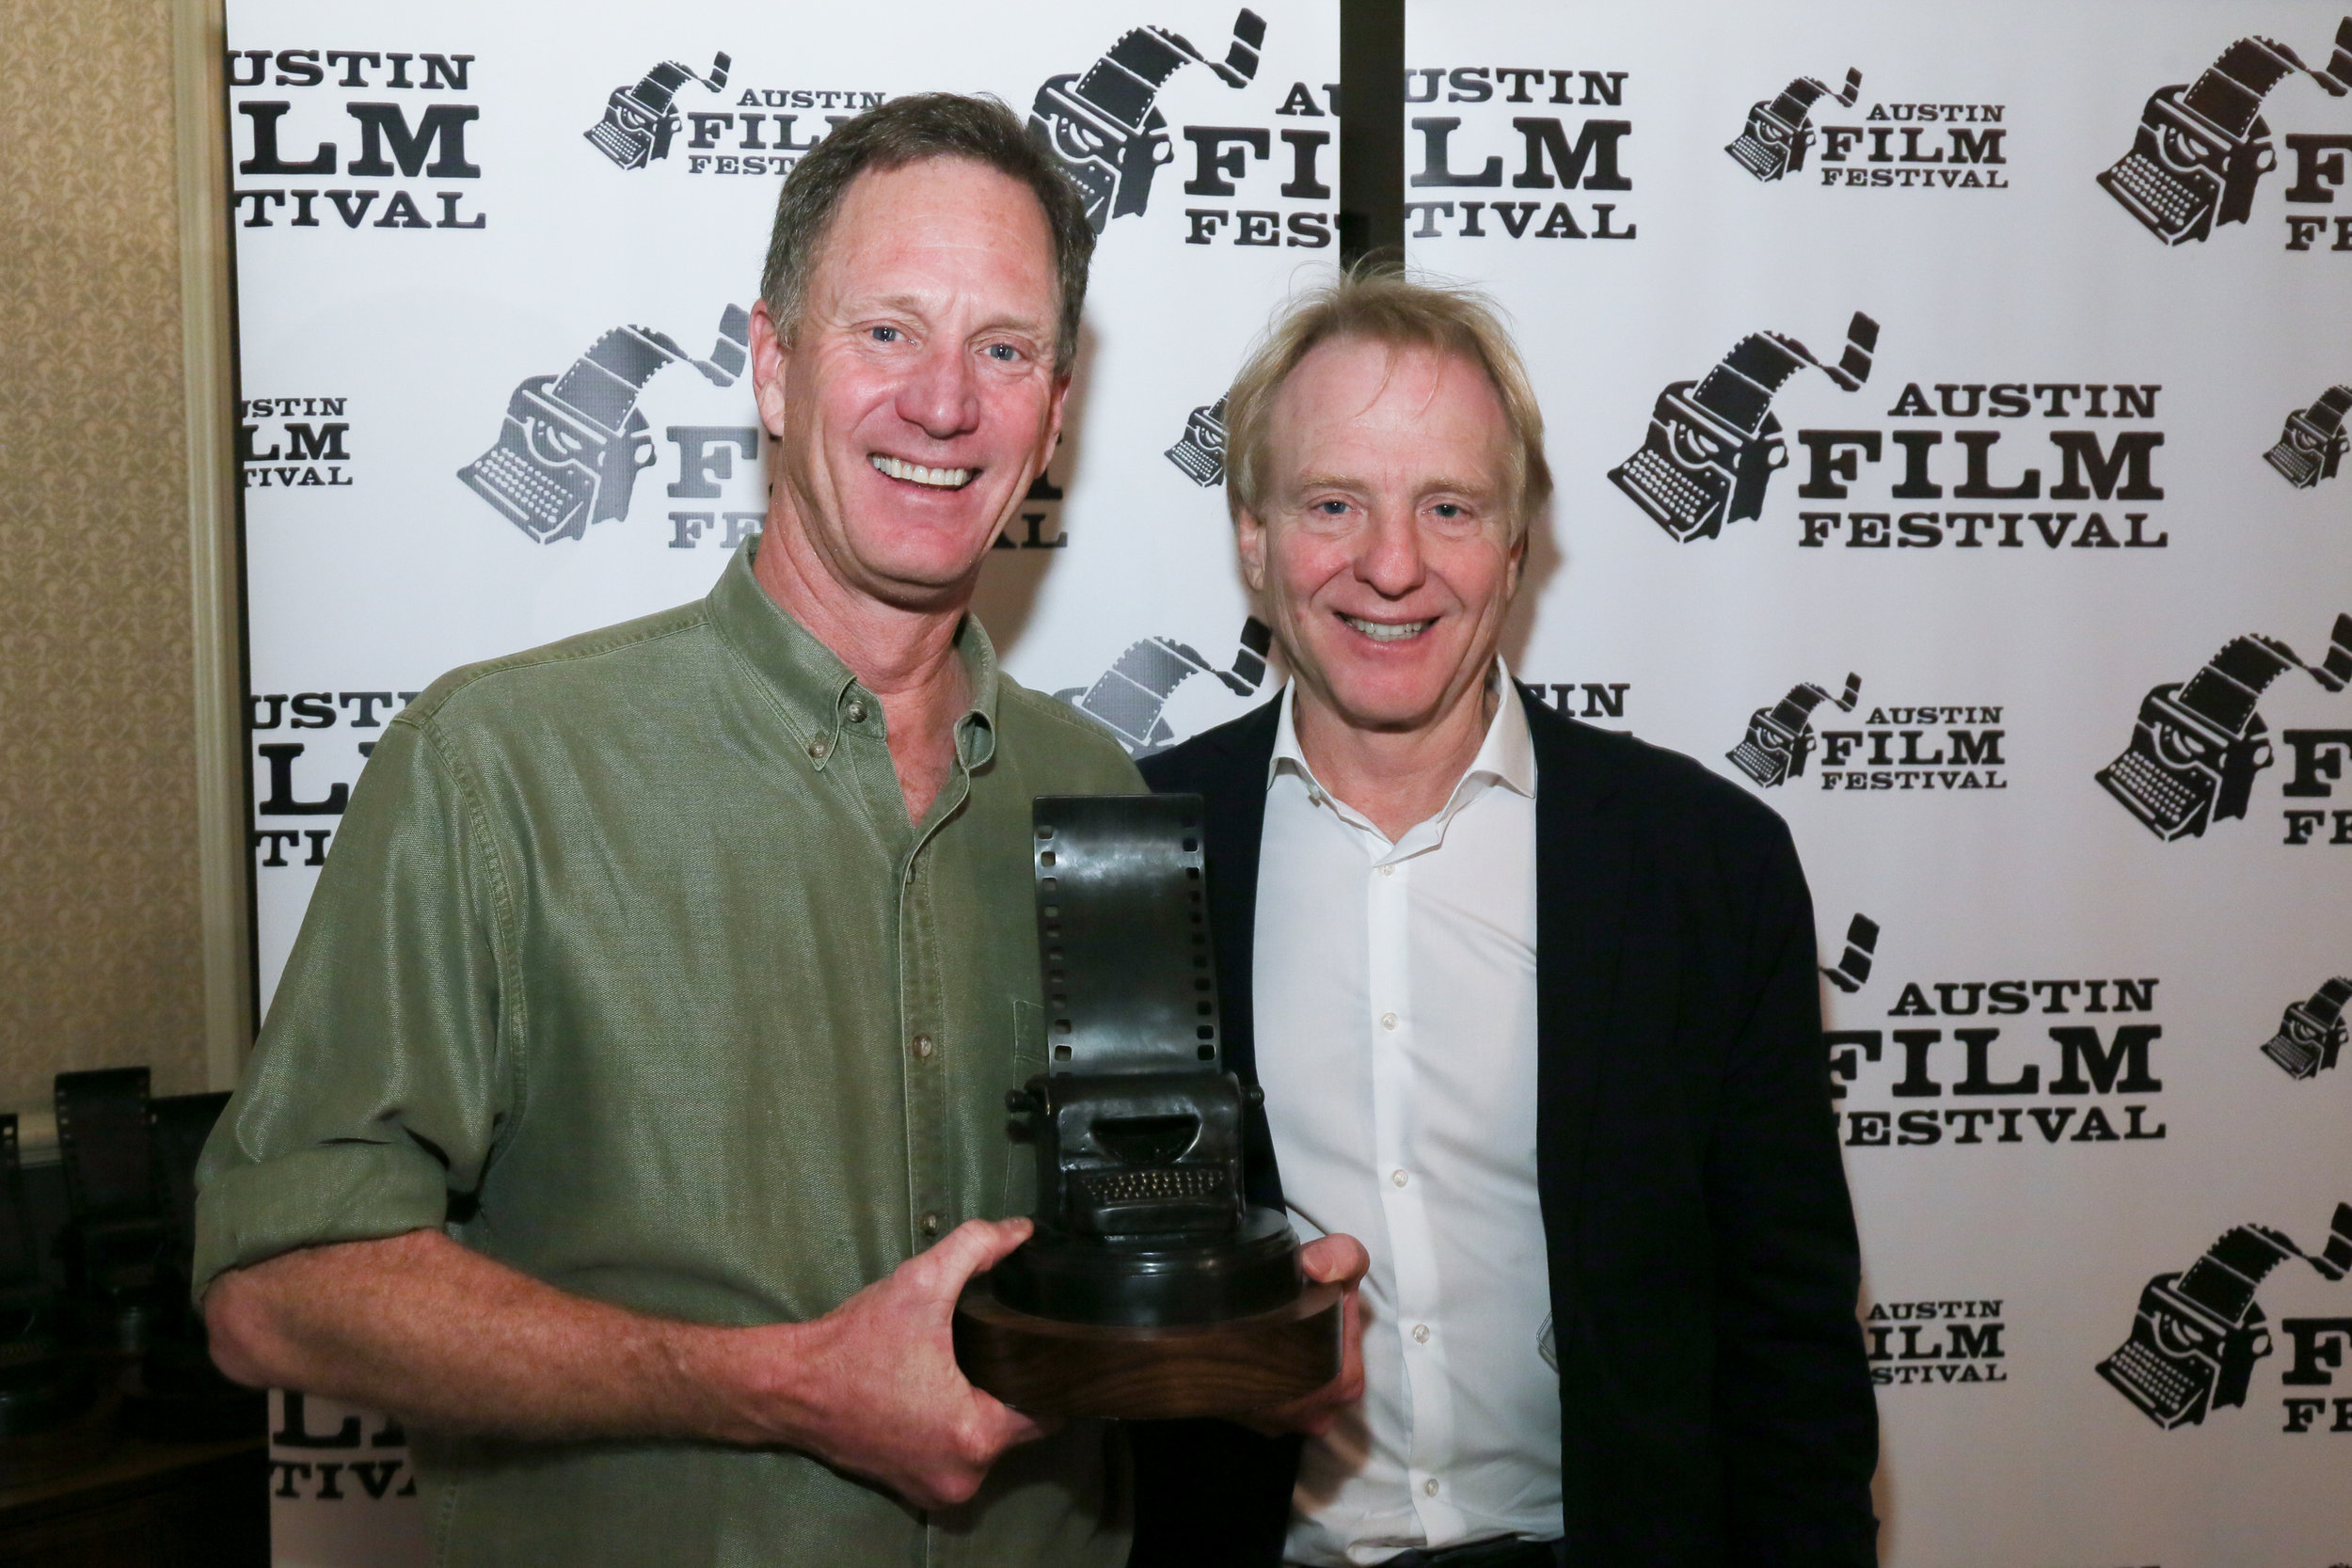 John Stimpson and Geoff Taylor